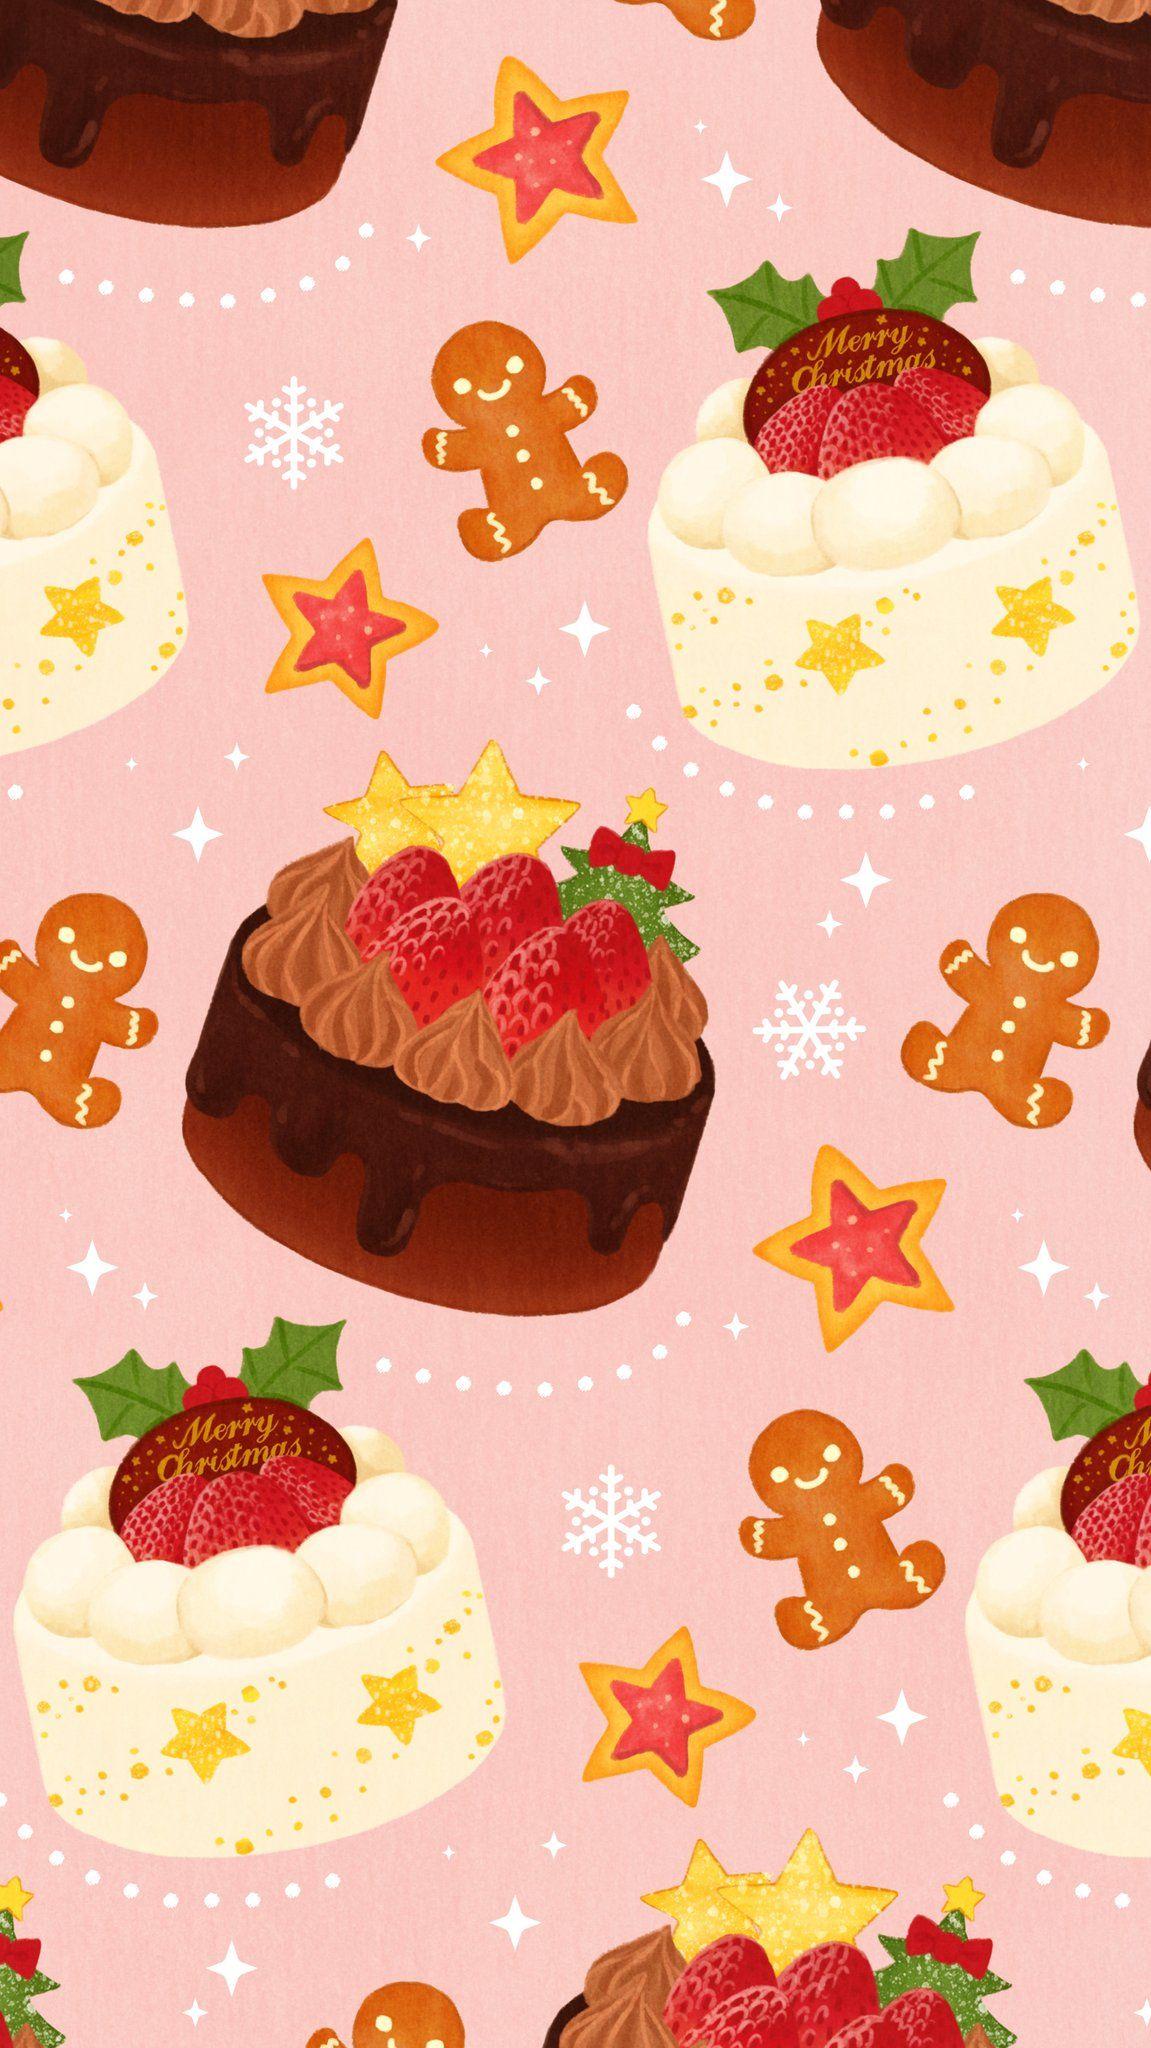 Omiyu みゆき In Cake Wallpaper Cute Screen Savers Cow Print Wallpaper